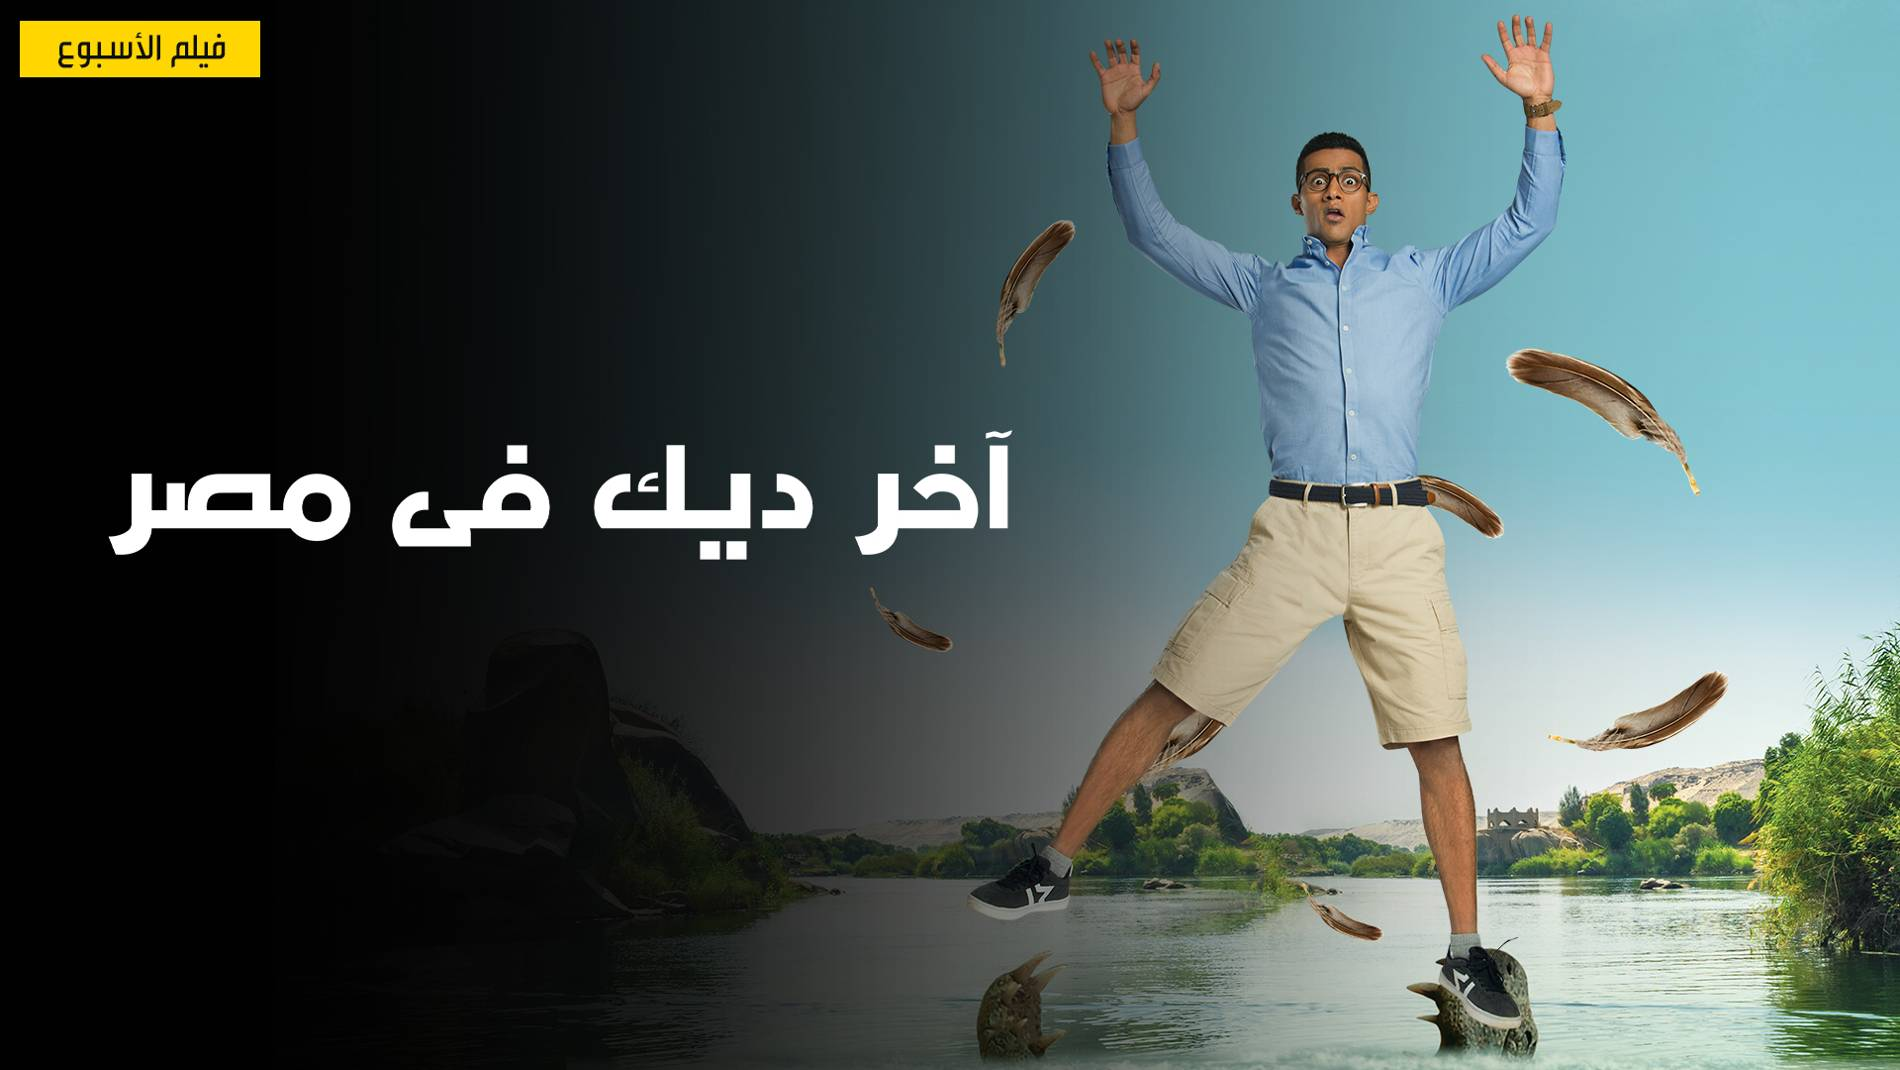 Akher Deek Fi Masr